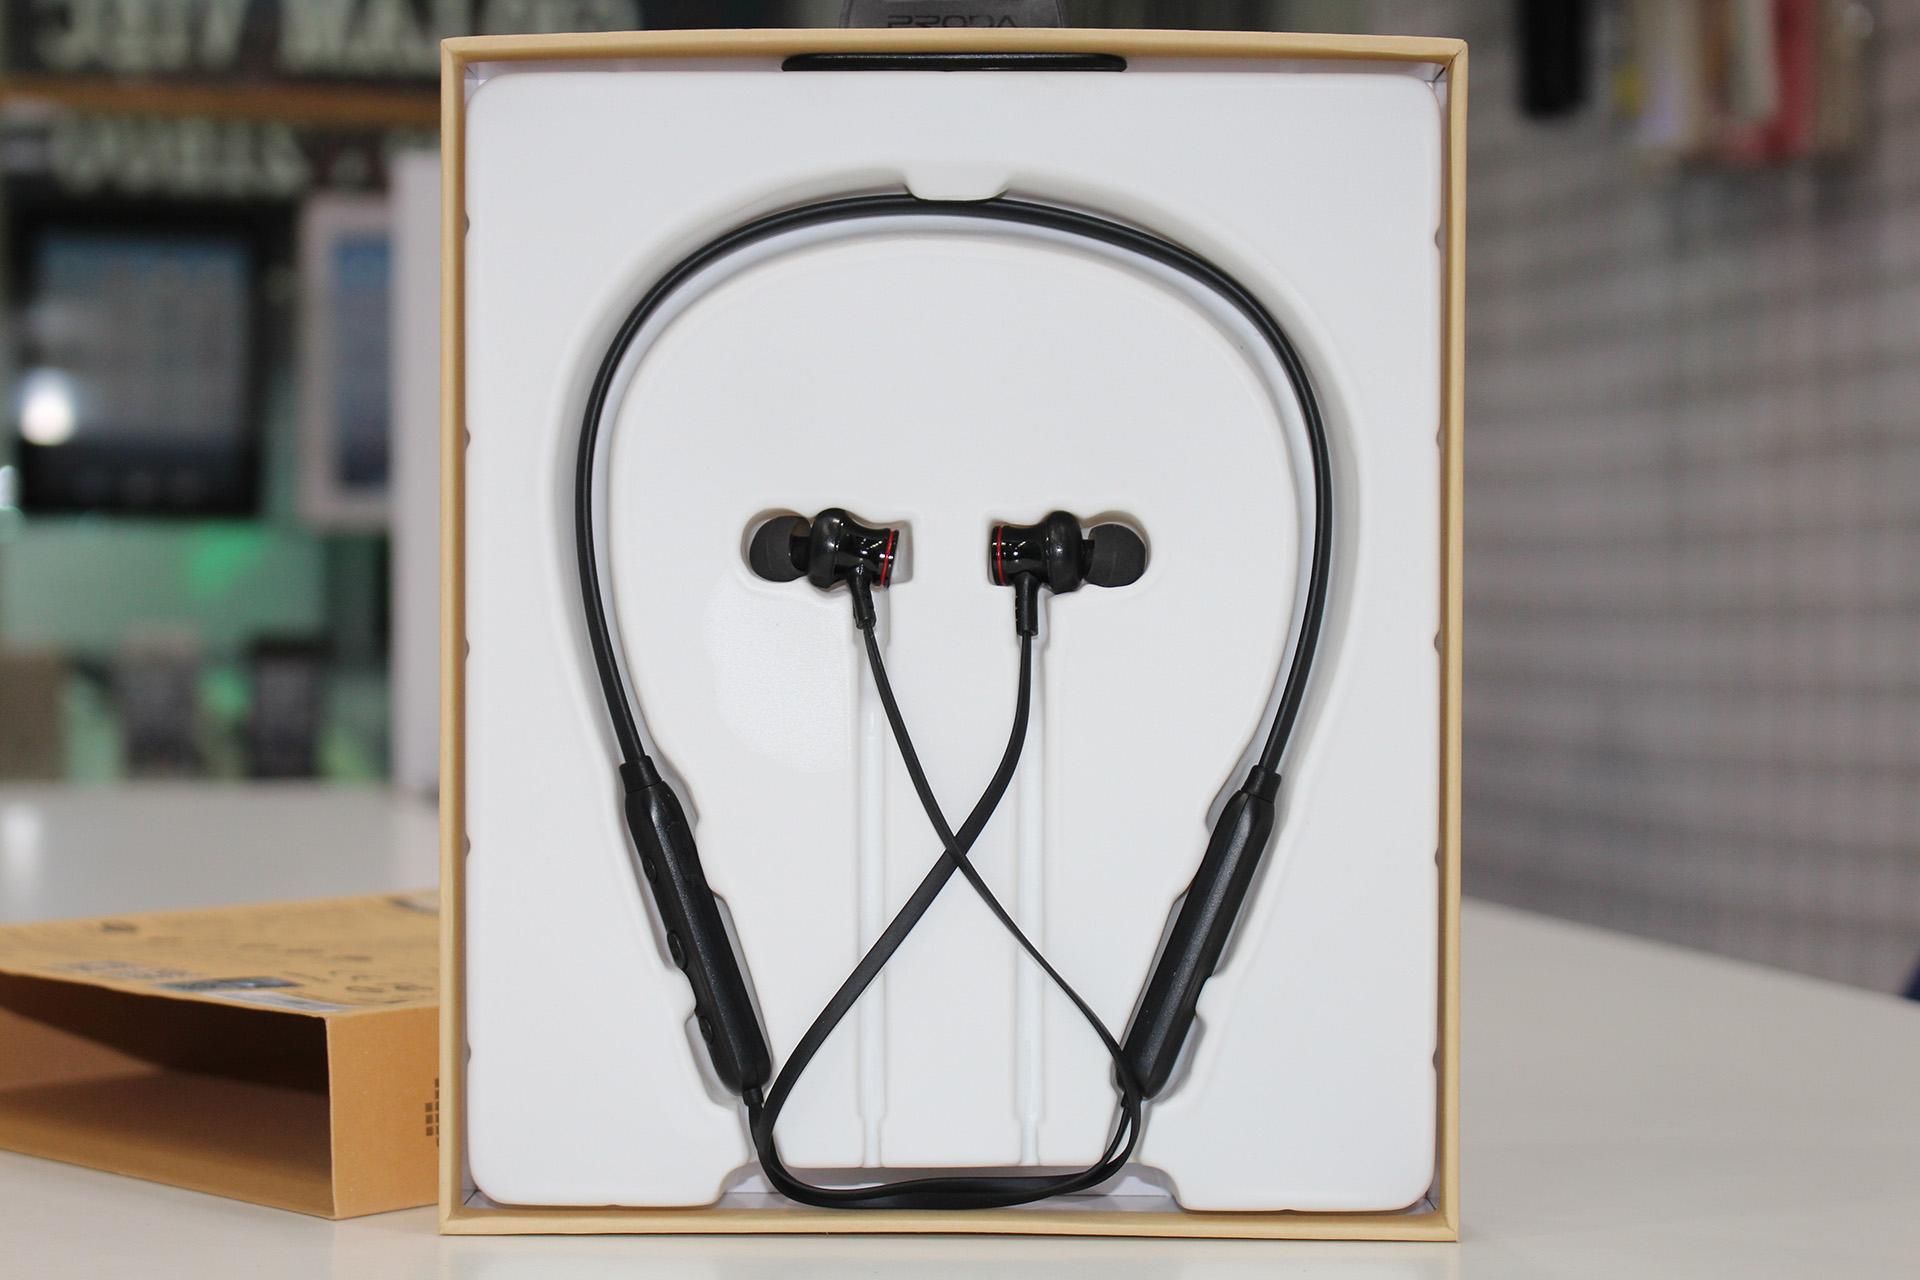 Tai nghe thể thao Proda PD-BN100